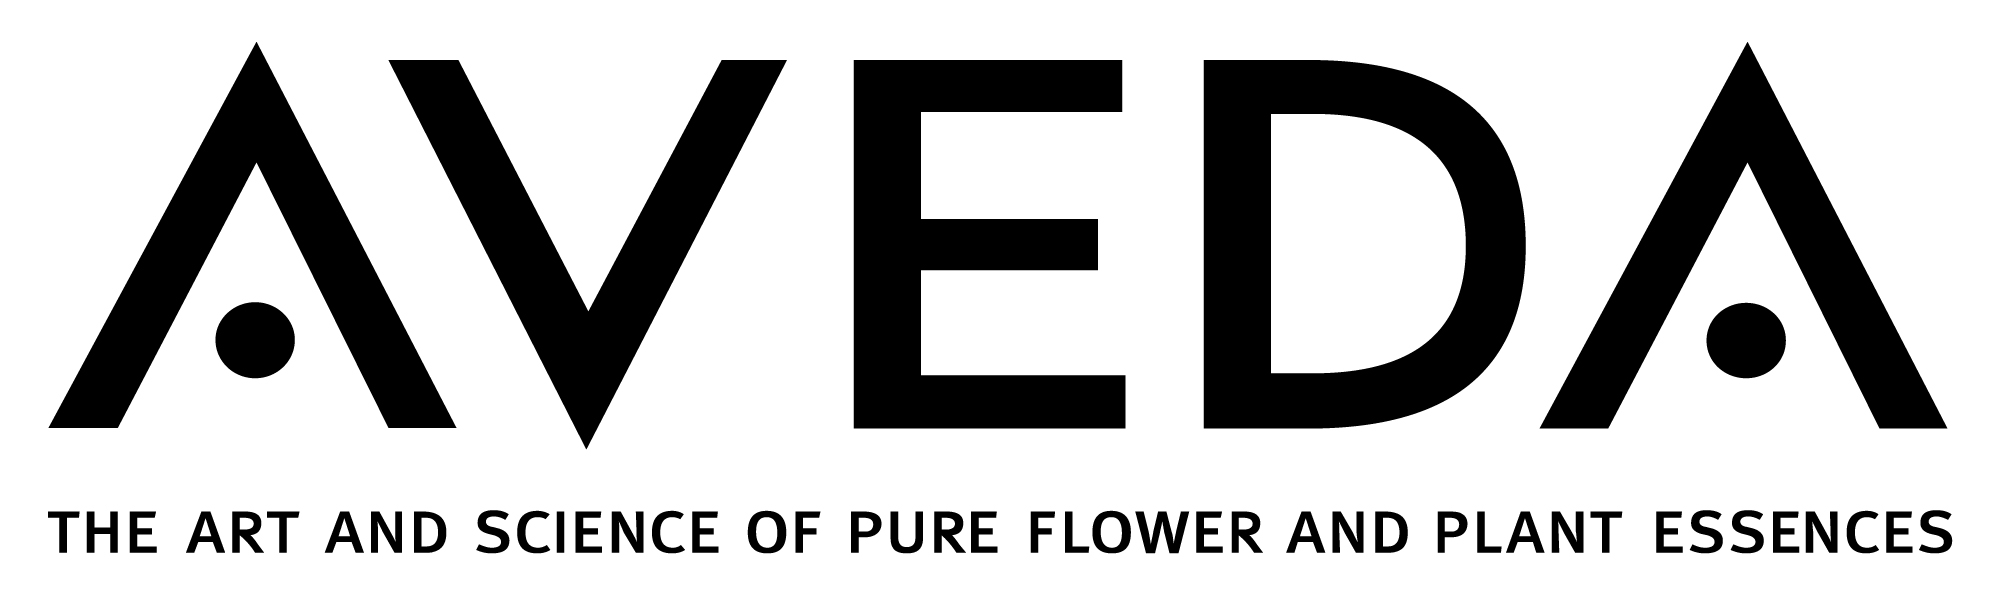 Aveda Logo 09 one line.jpg